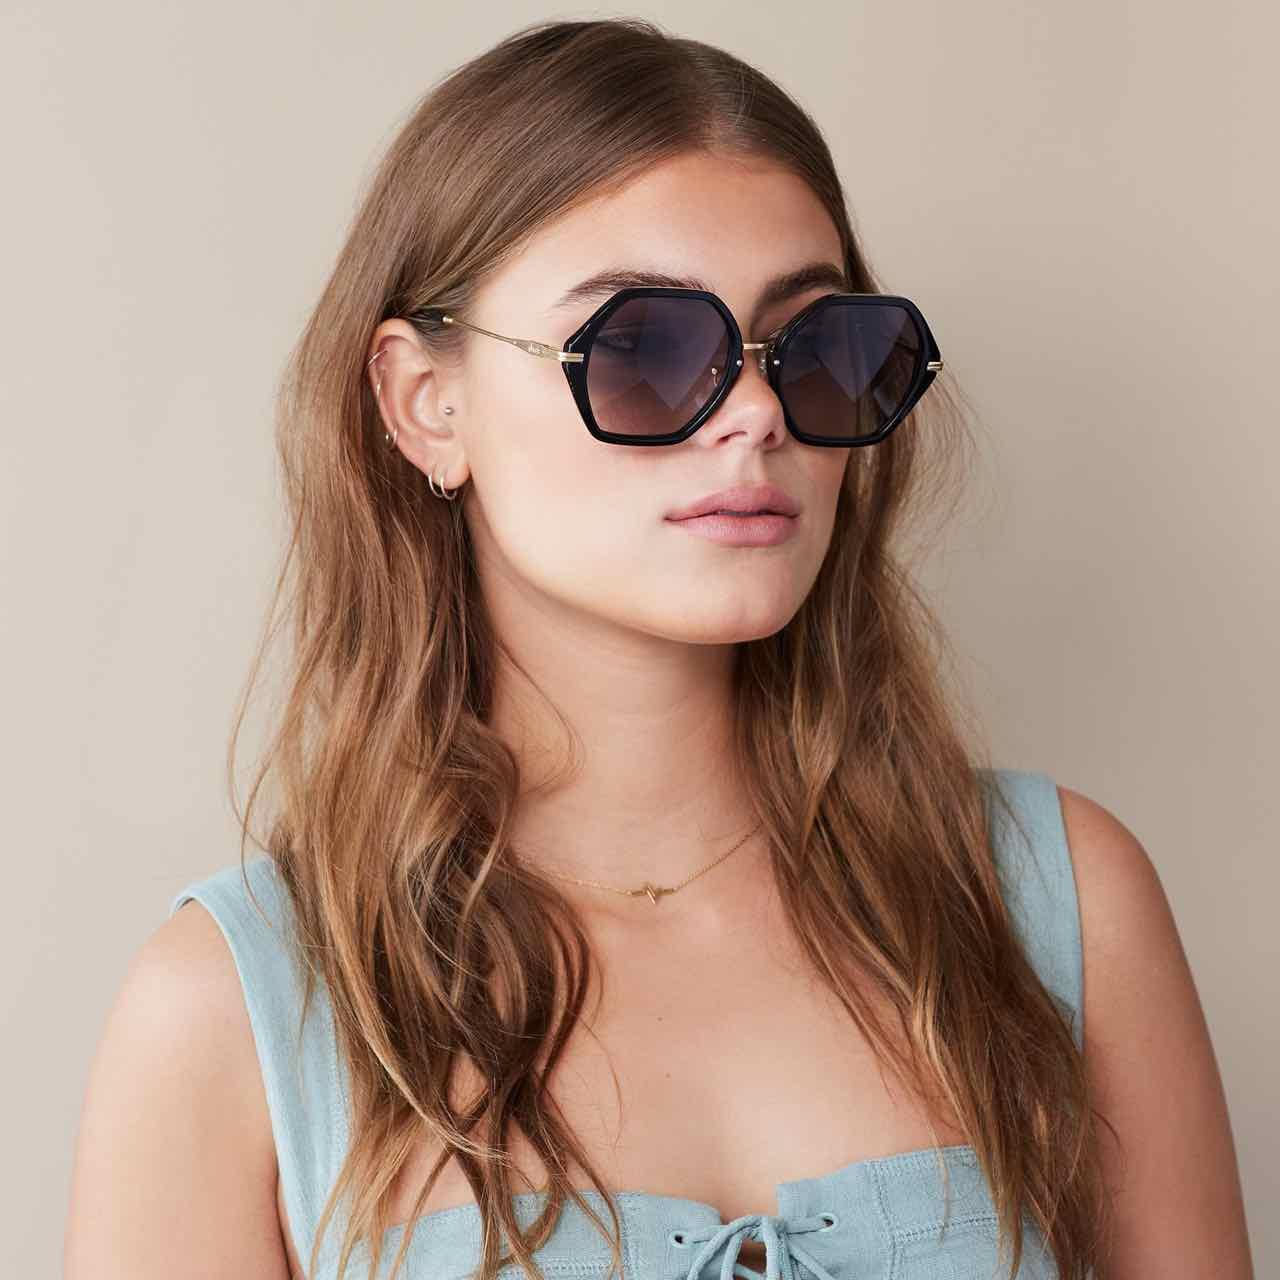 b1e7b629a8 SONIX Sunglasses WILLOW Black Frame Black Lenses